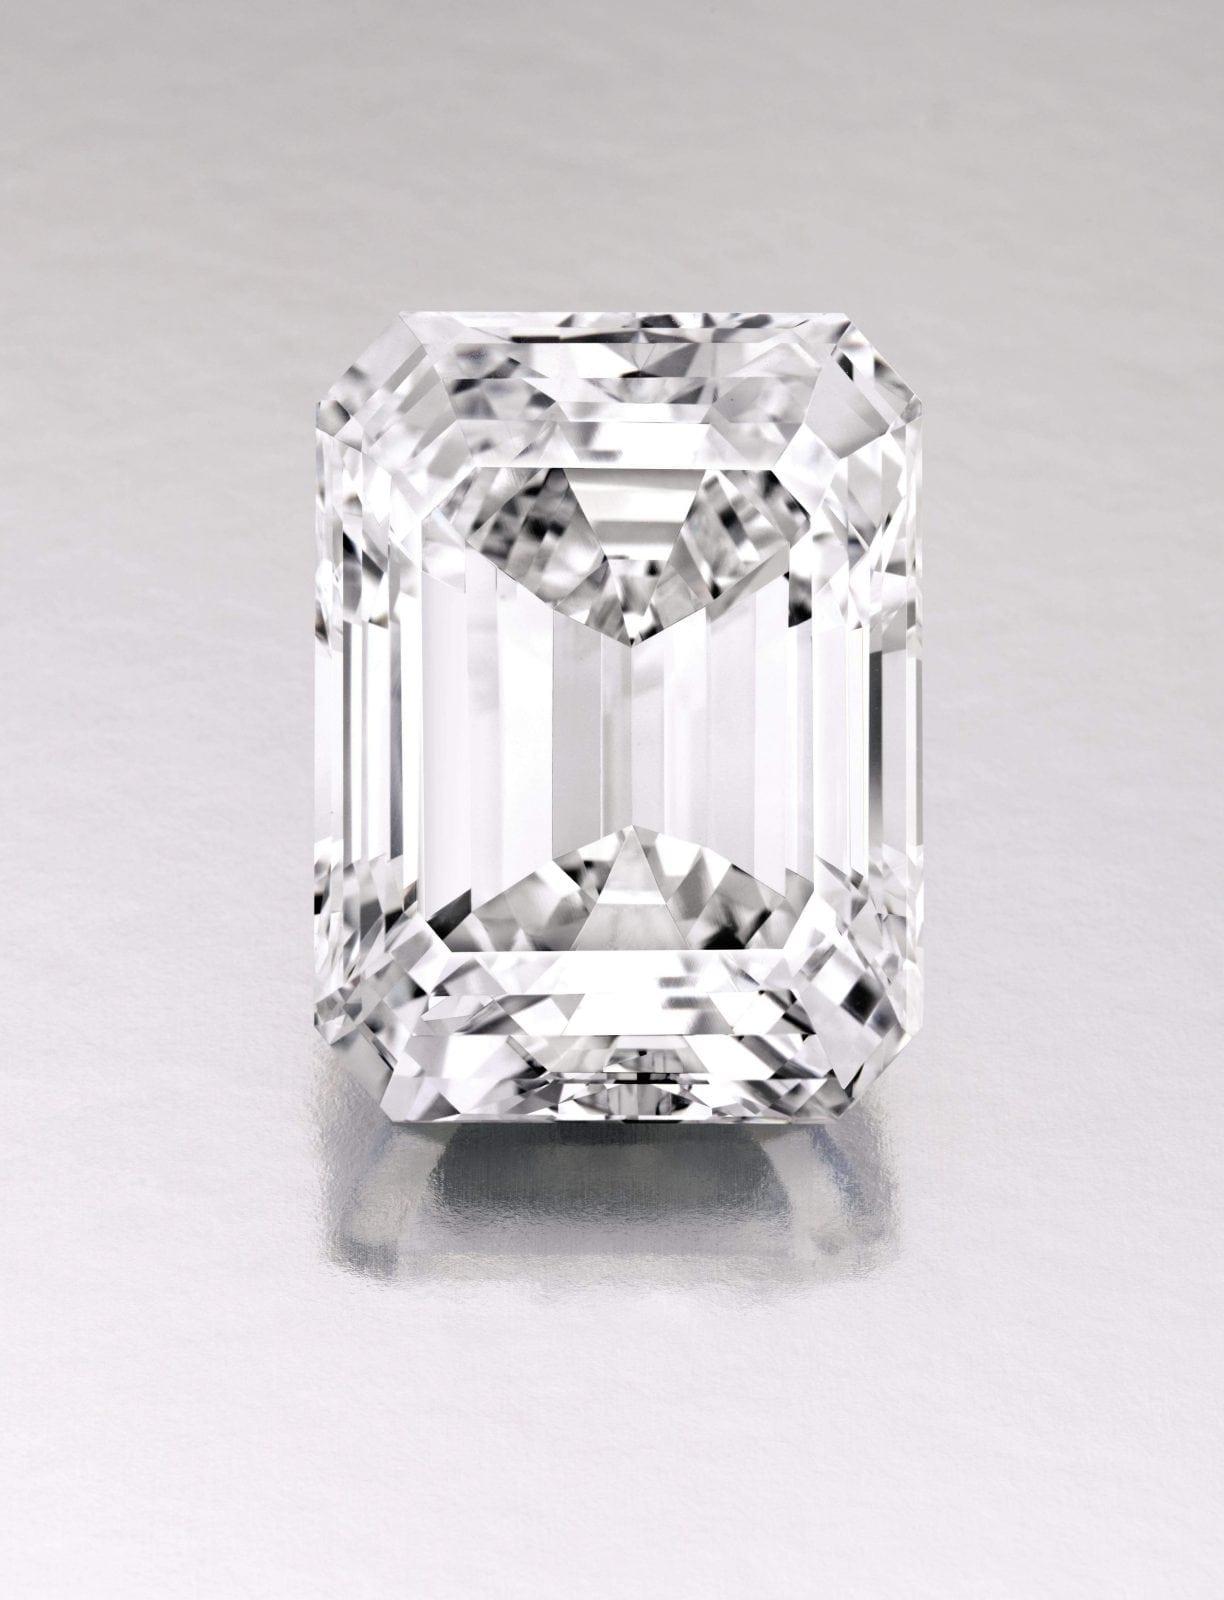 bilde - Diamantul perfect: 100 carate / 22,2 milioane de euro